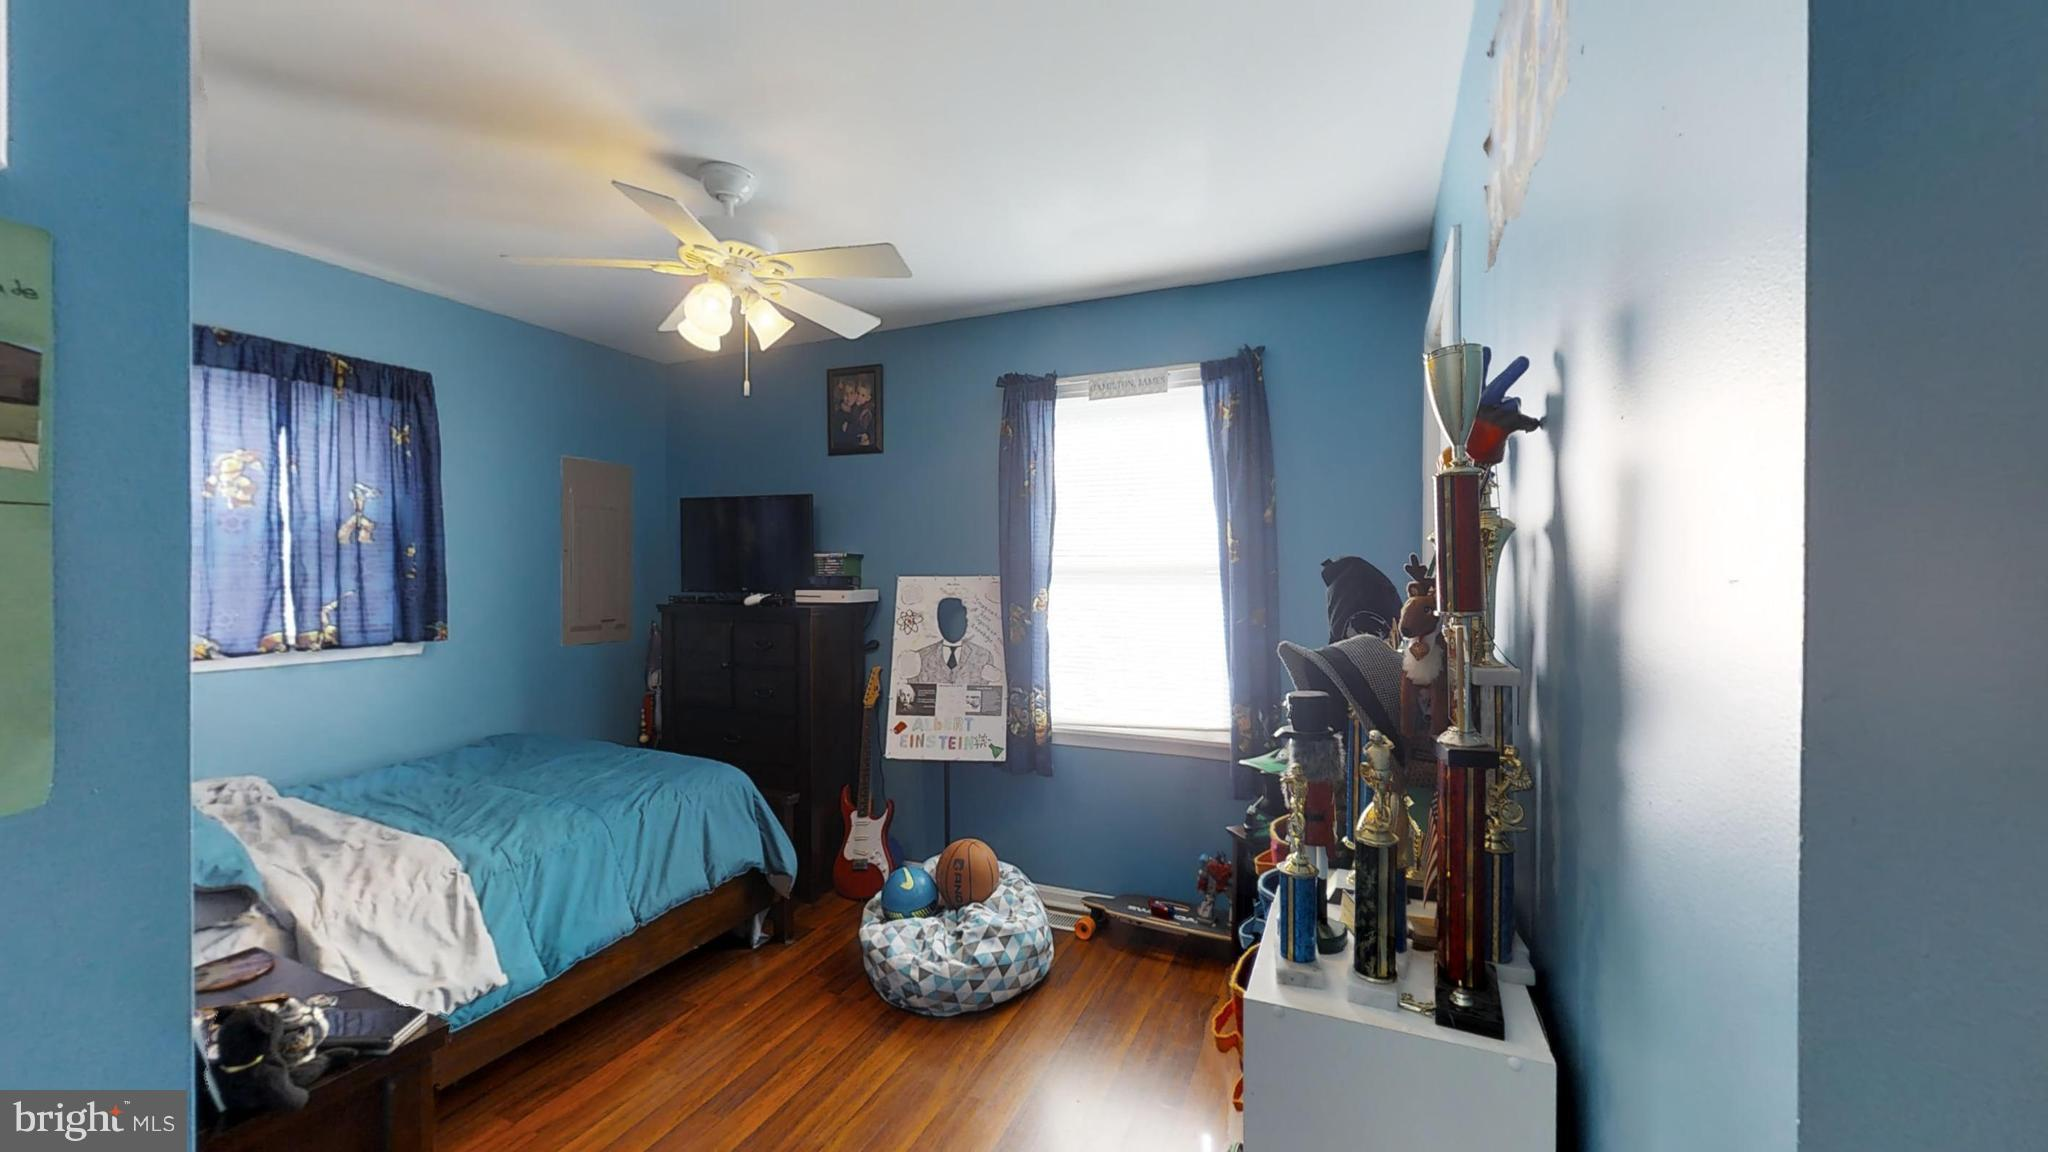 26596 YOWAISKI MILL ROAD, Mechanicsville, MD, 20659 - SOLD LISTING ...